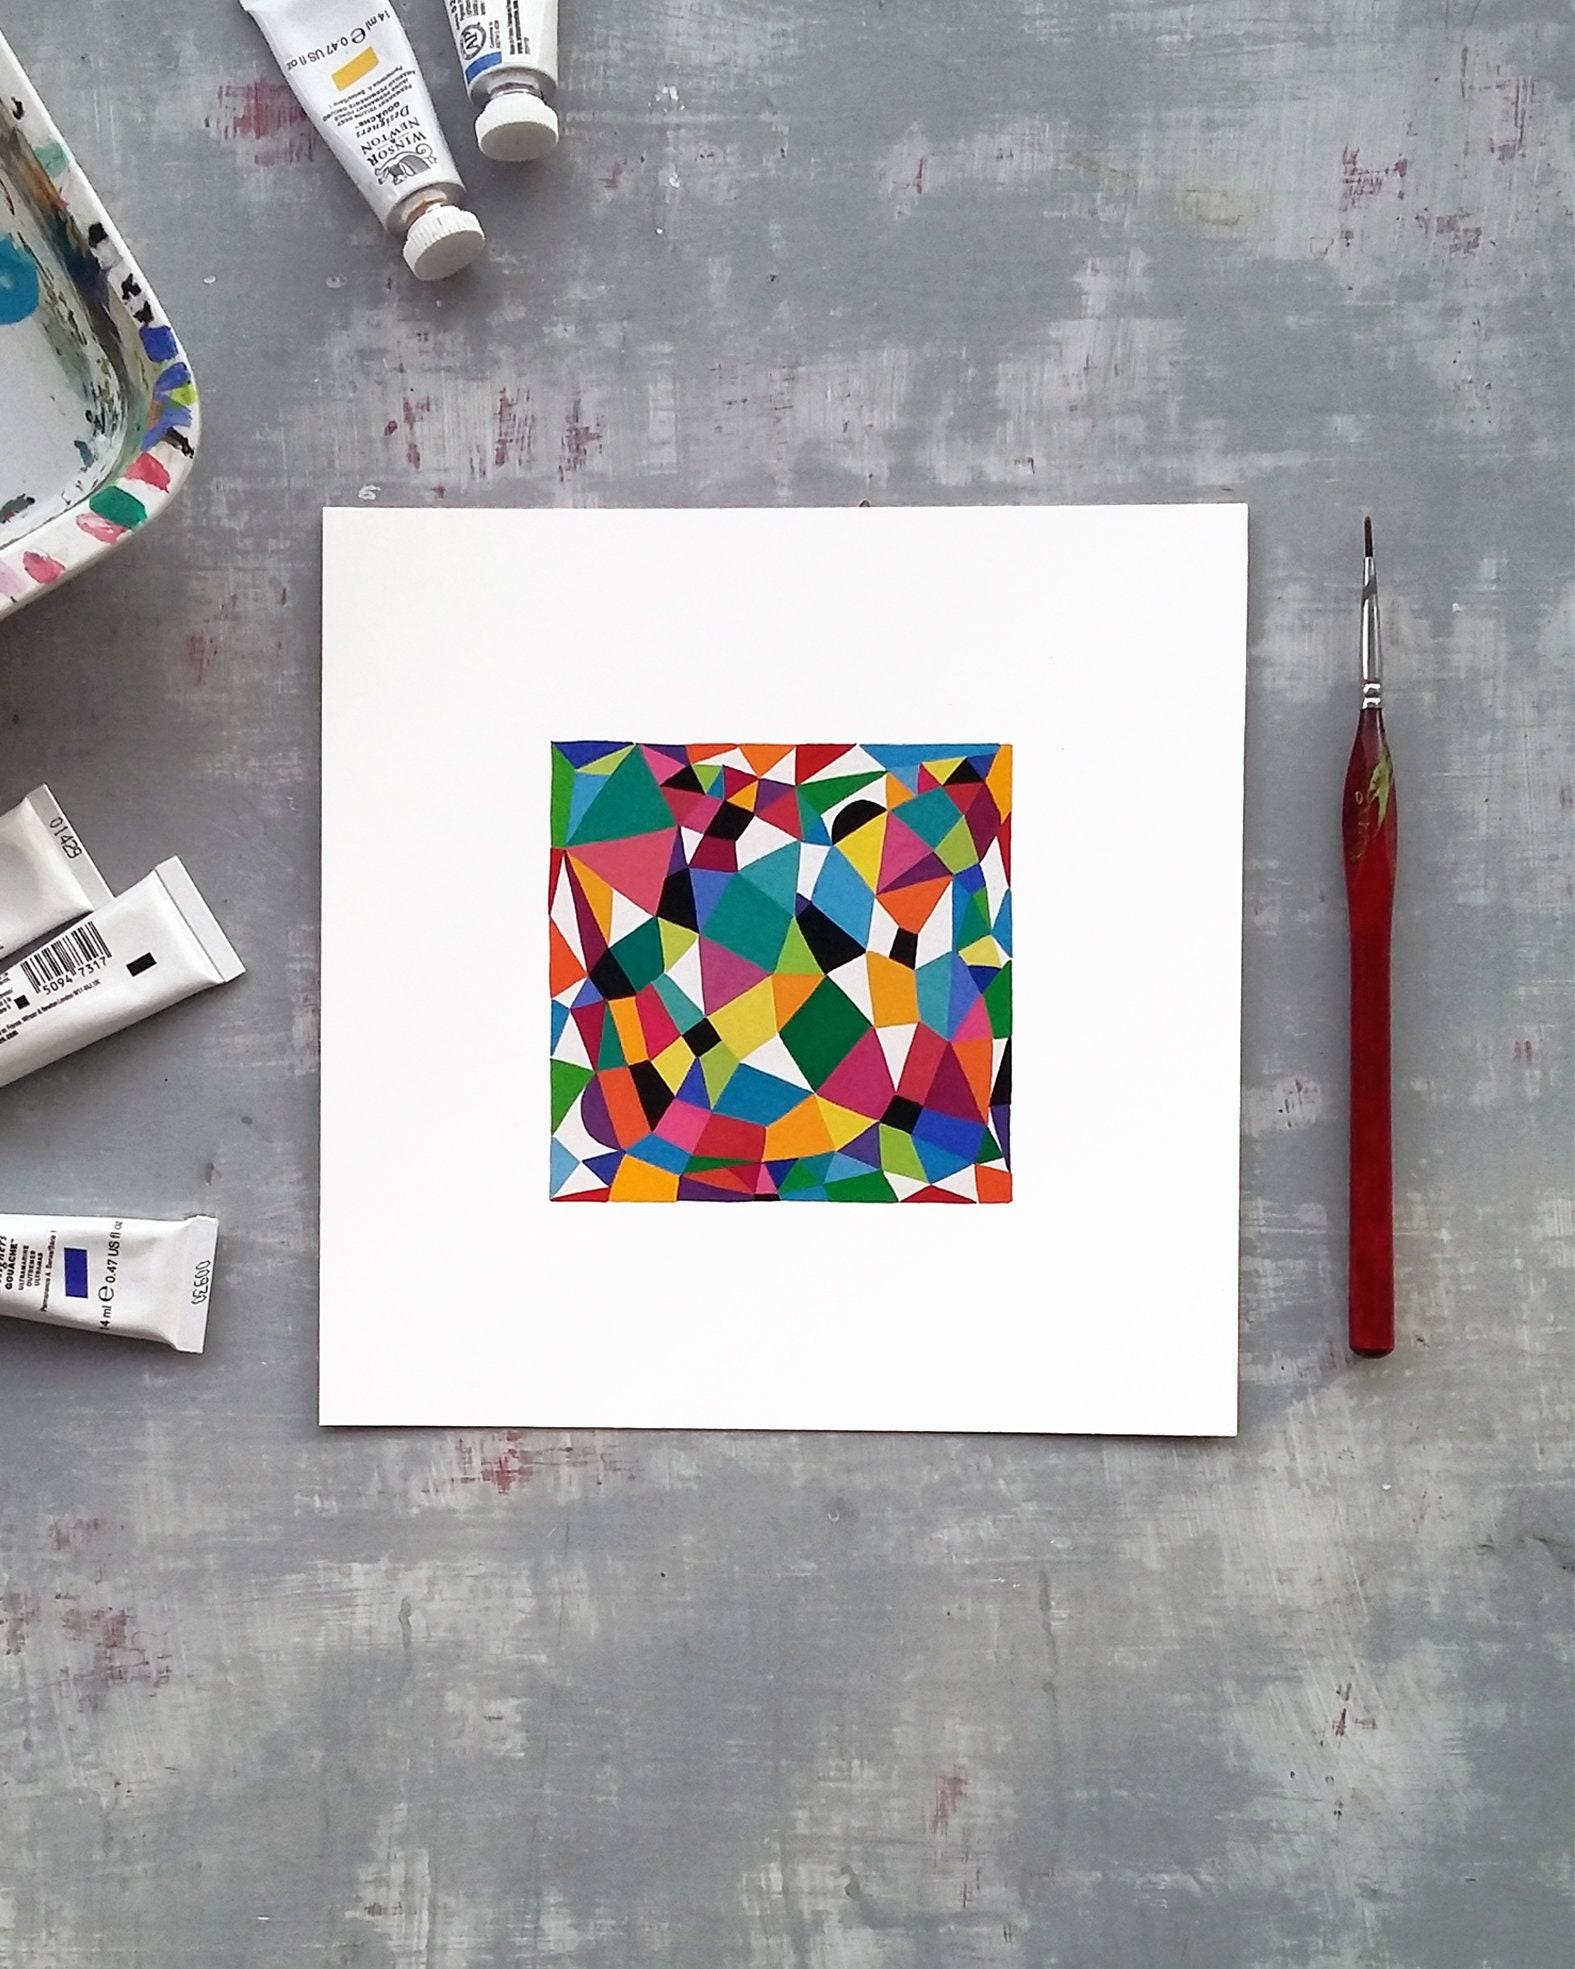 Grid_001, small geometric illustration - product image